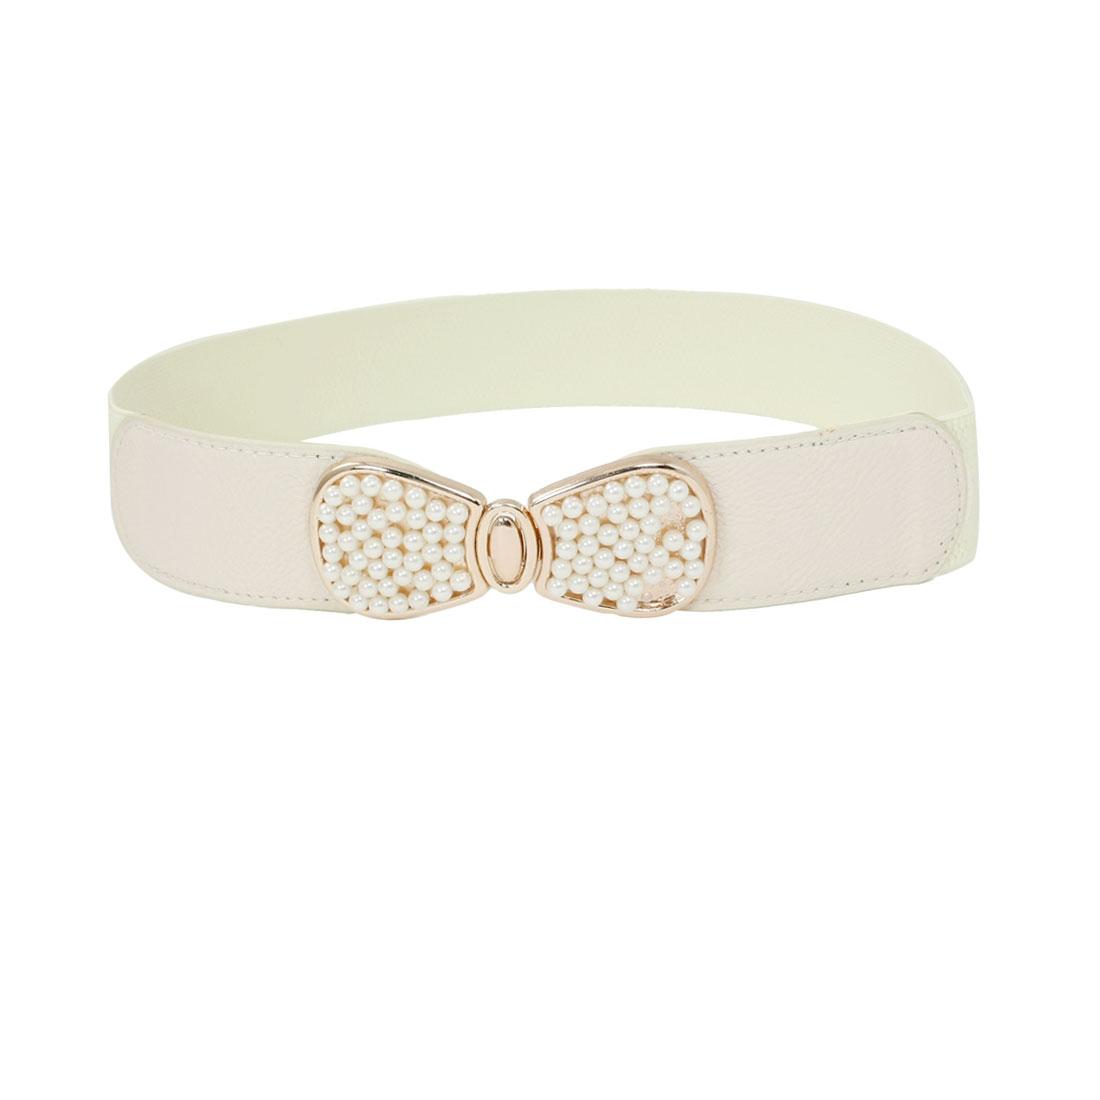 Women Plastic Beads Inlaid Bowknot Interlock Buckle Elastic Waist Belt Off White